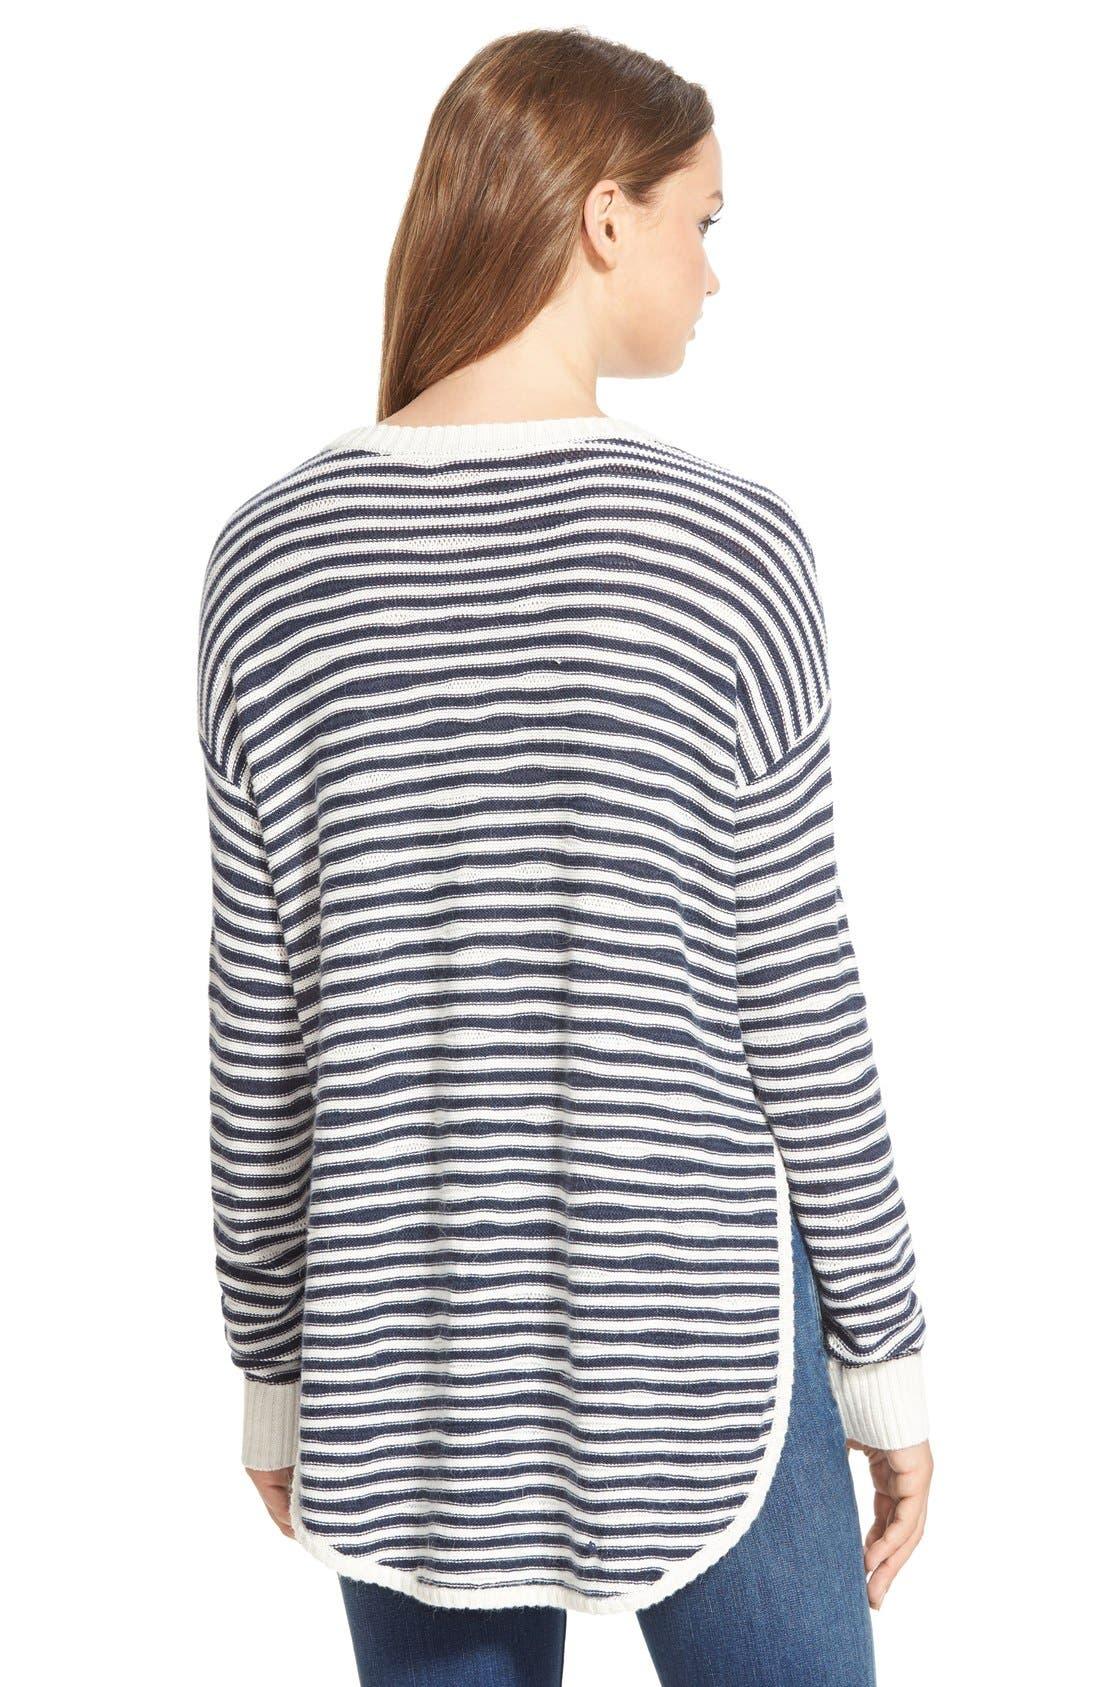 TREASURE & BOND, Treasure&Bond Asymmetrical Stripe Sweater, Alternate thumbnail 5, color, 400